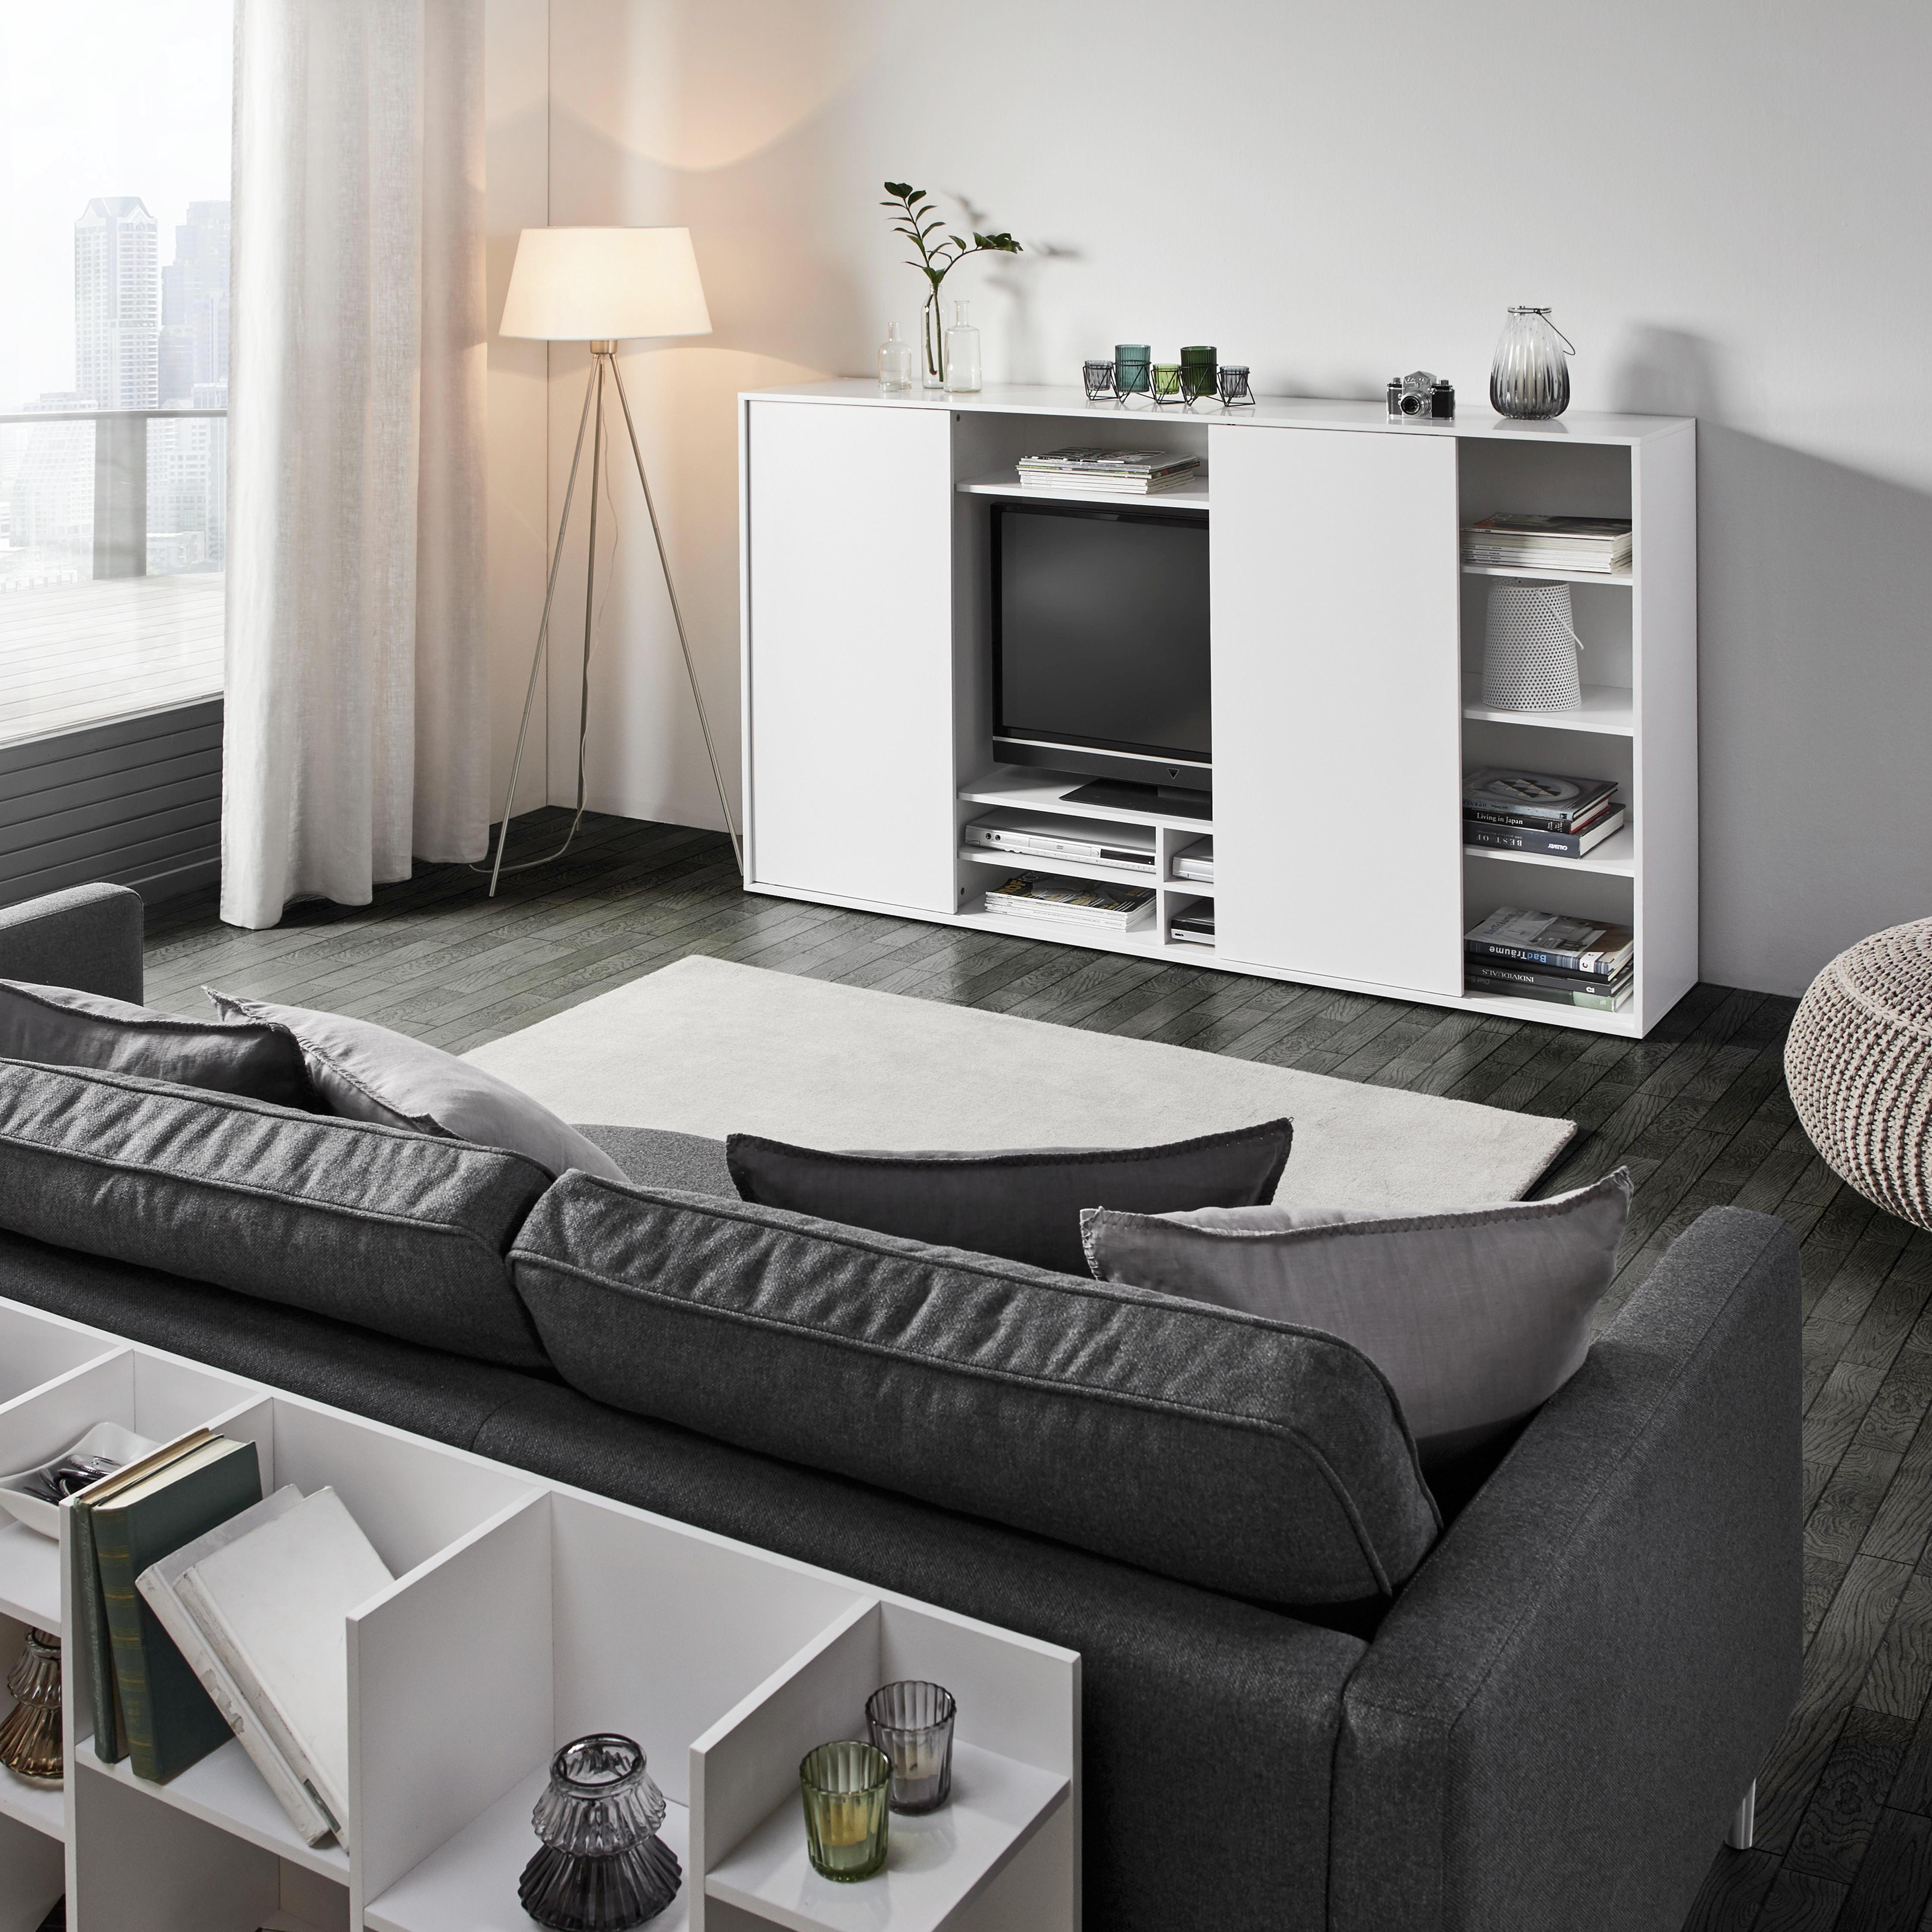 Viersitzer Sofa Bert - Chromfarben/Dunkelgrau, MODERN, Textil/Metall (225/82/97cm) - PREMIUM LIVING